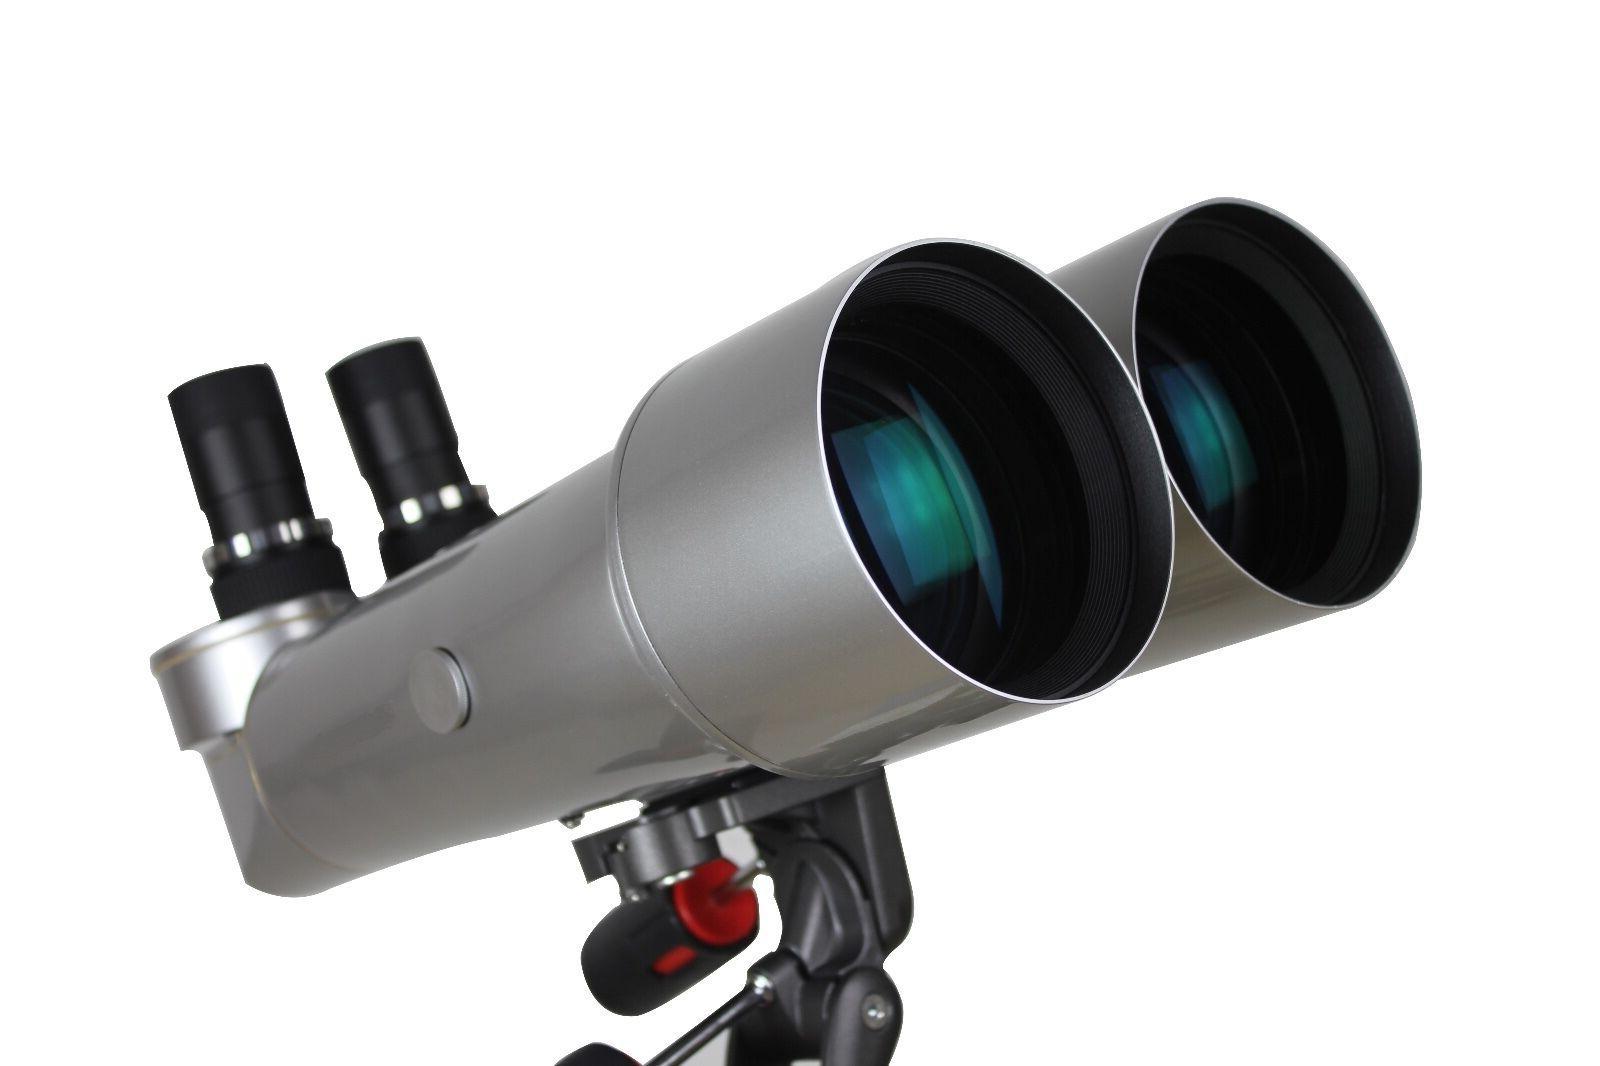 Binger 22x100 mm astronomical binoculars